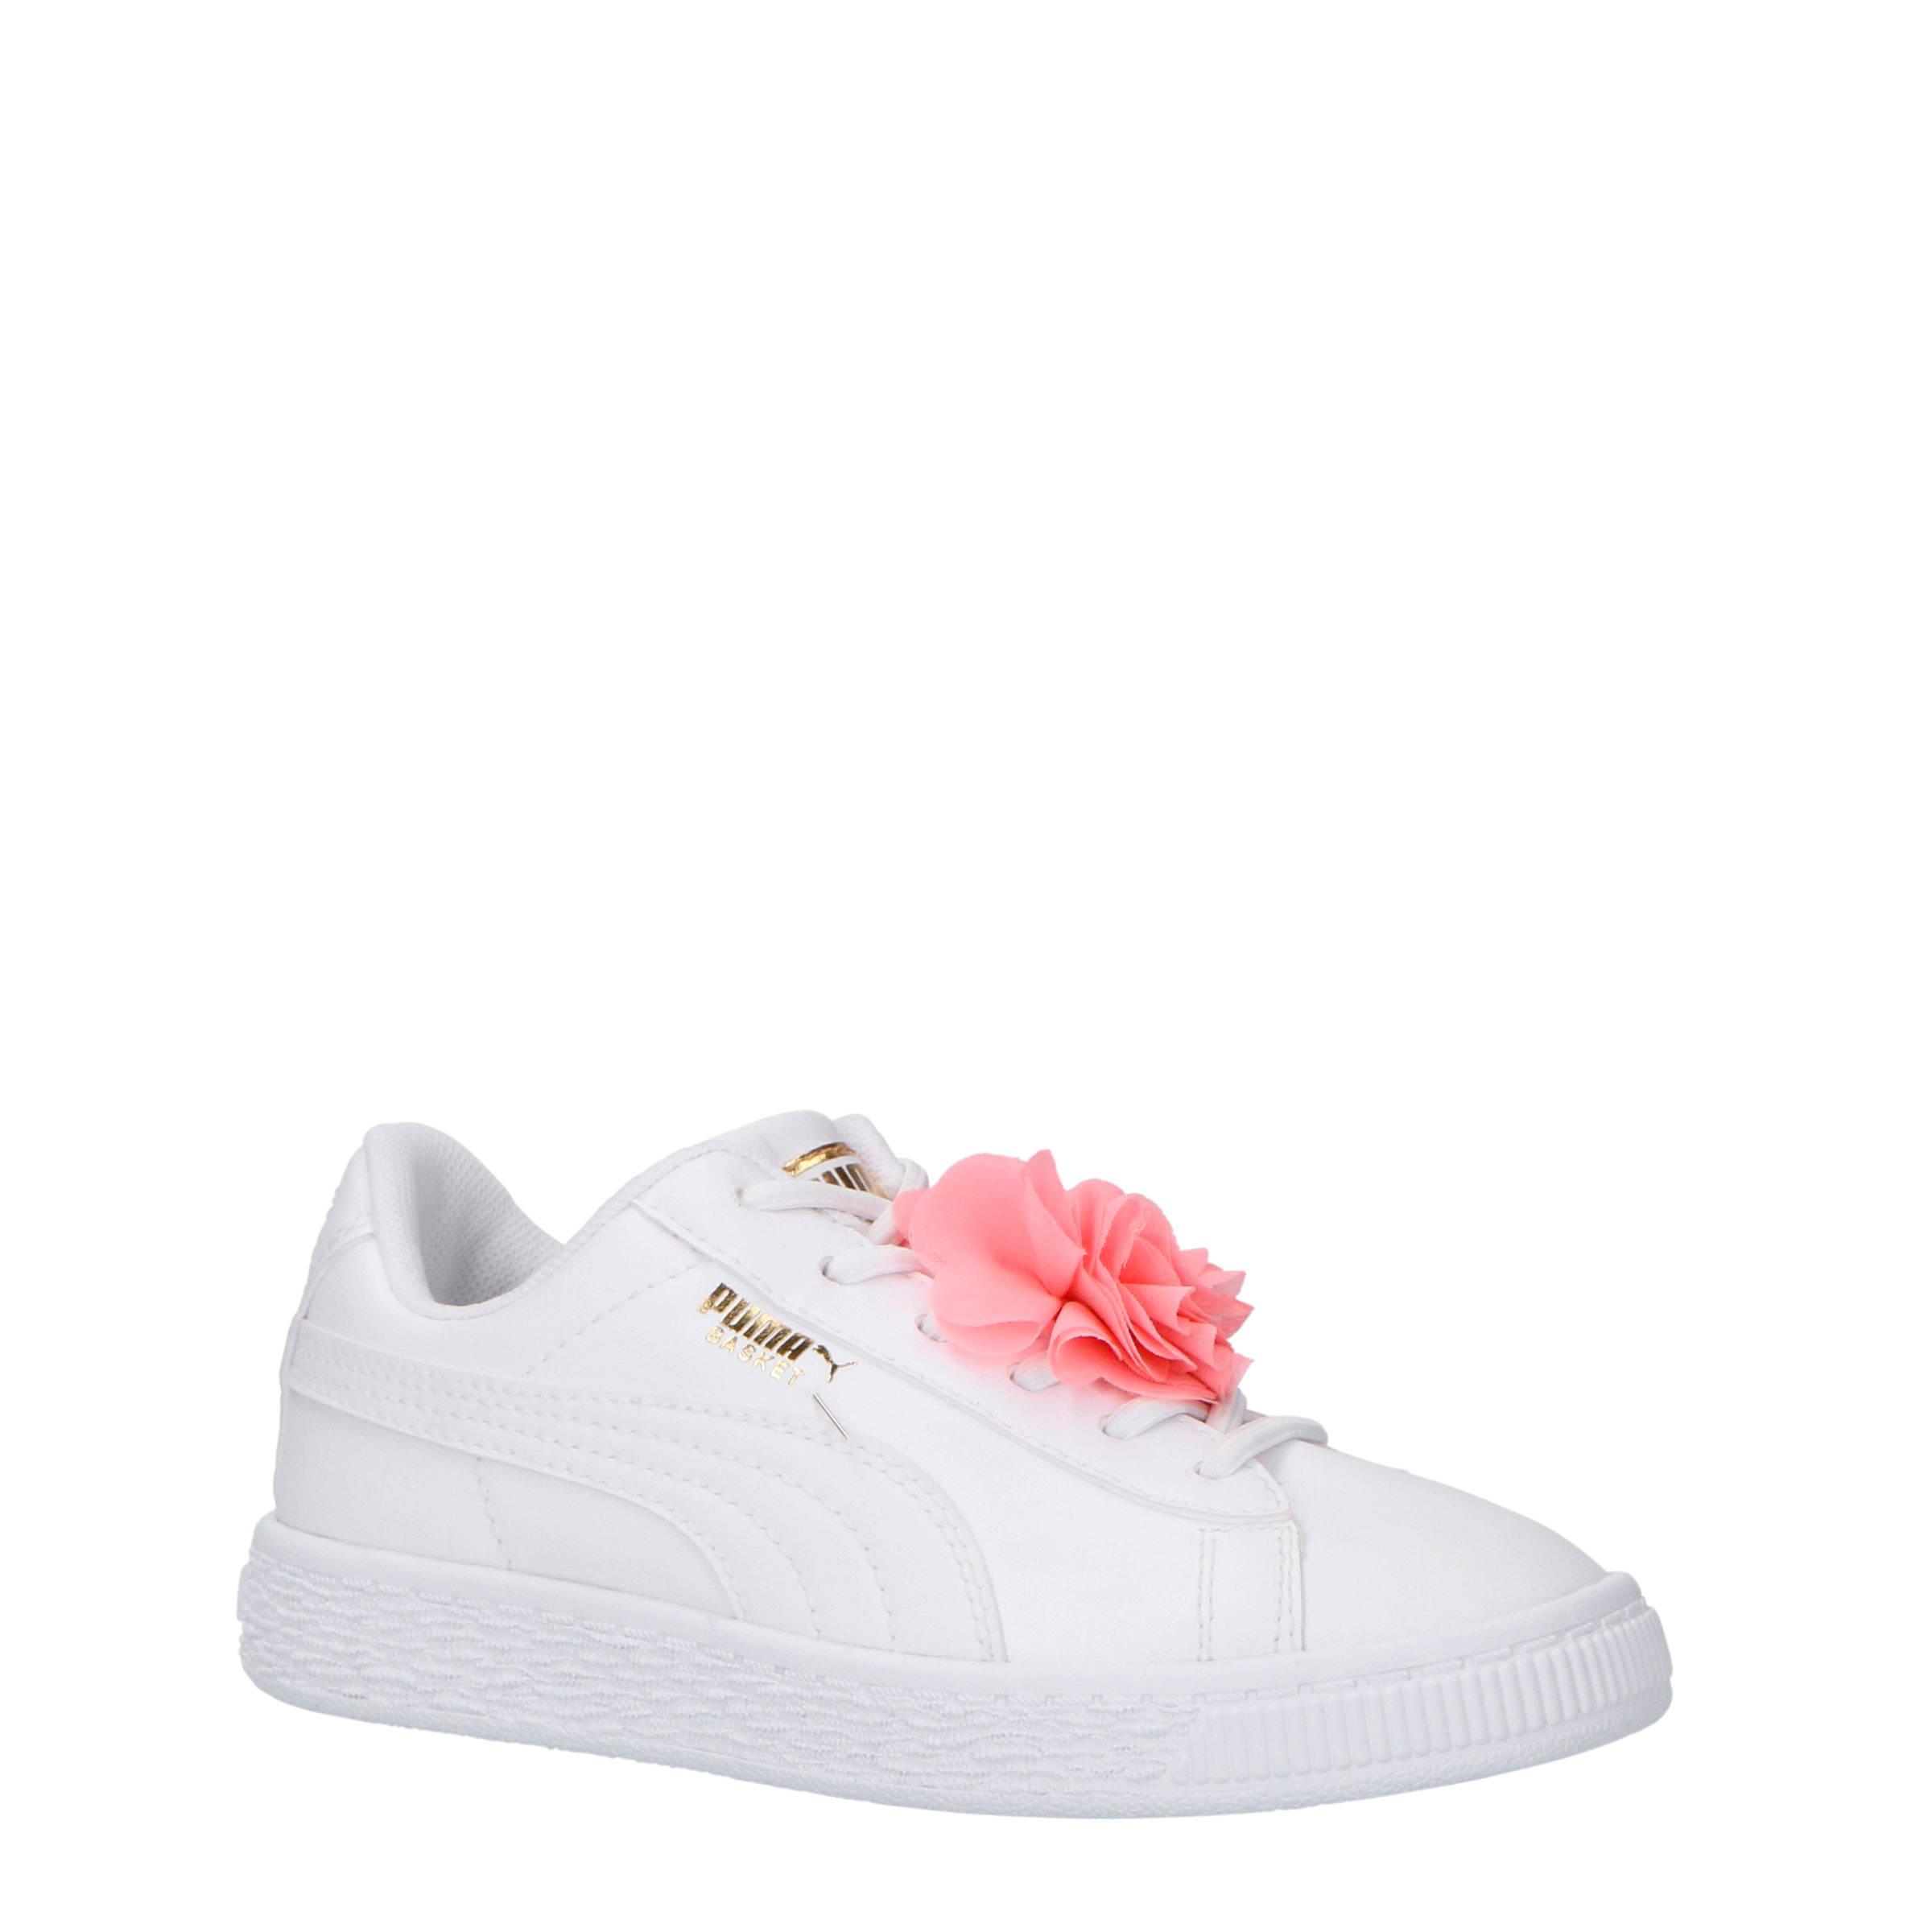 Basket Flower AC PS Puma White Pale Pink Vindjeschoen.nl